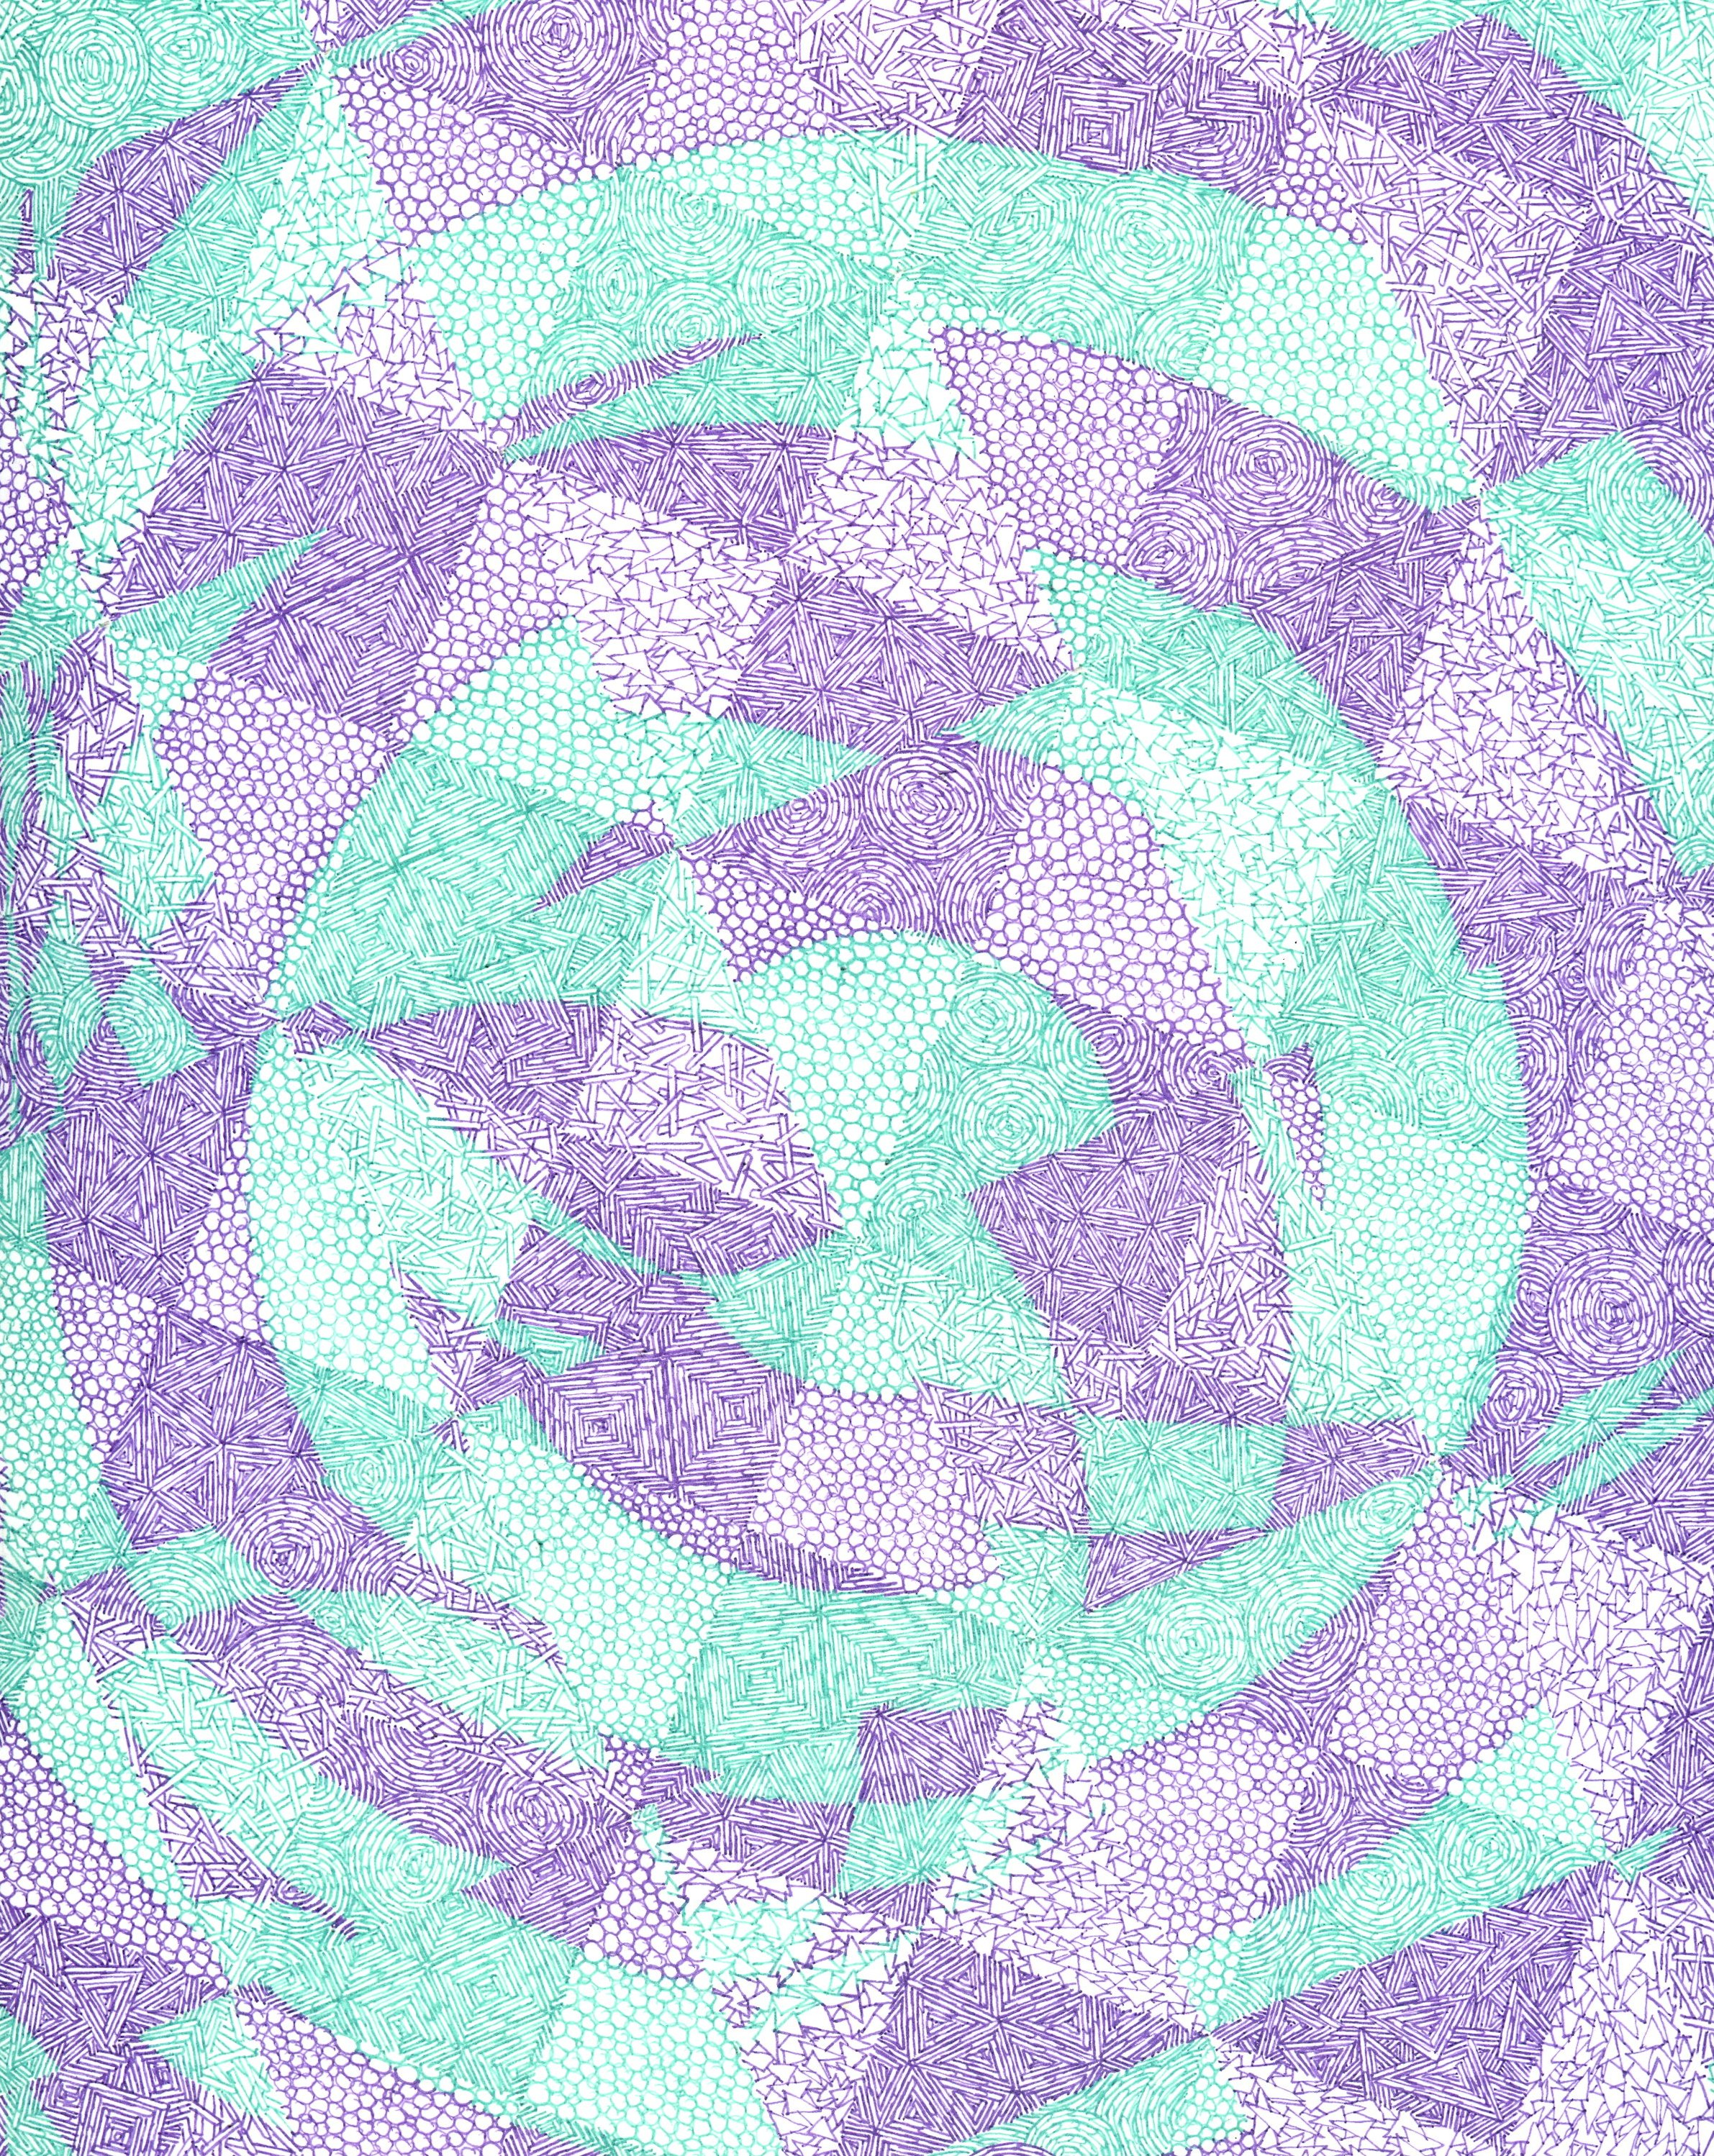 The Singulardity by Promethicon